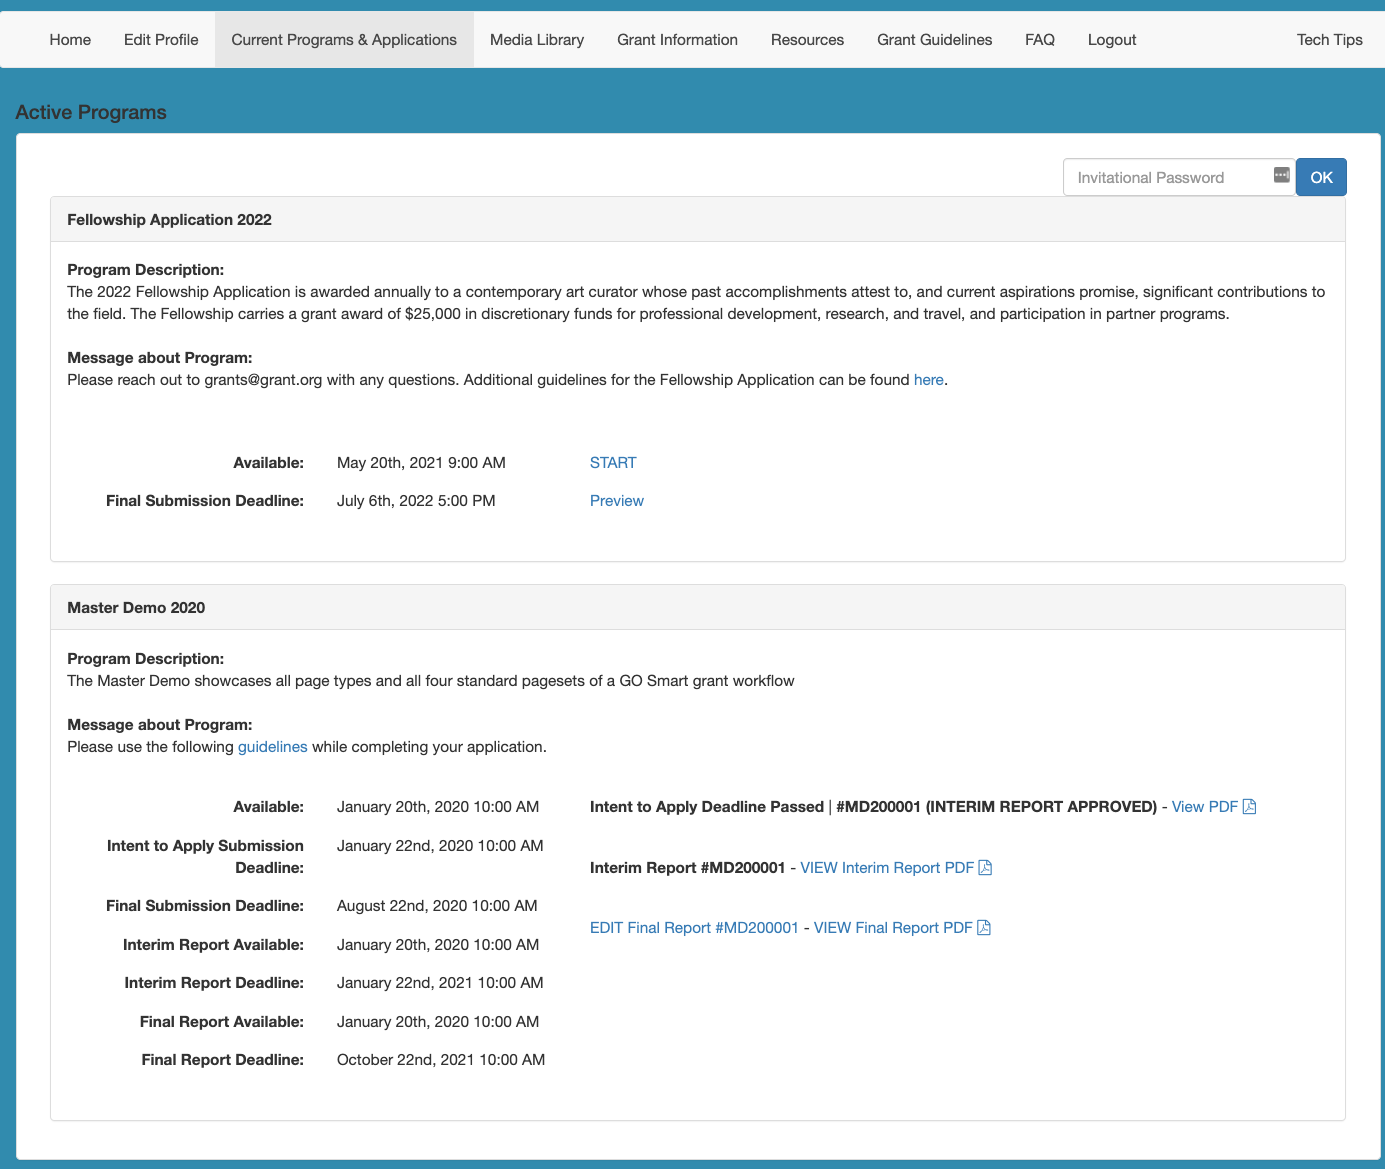 Screenshot of the Current Programs & Applications tab